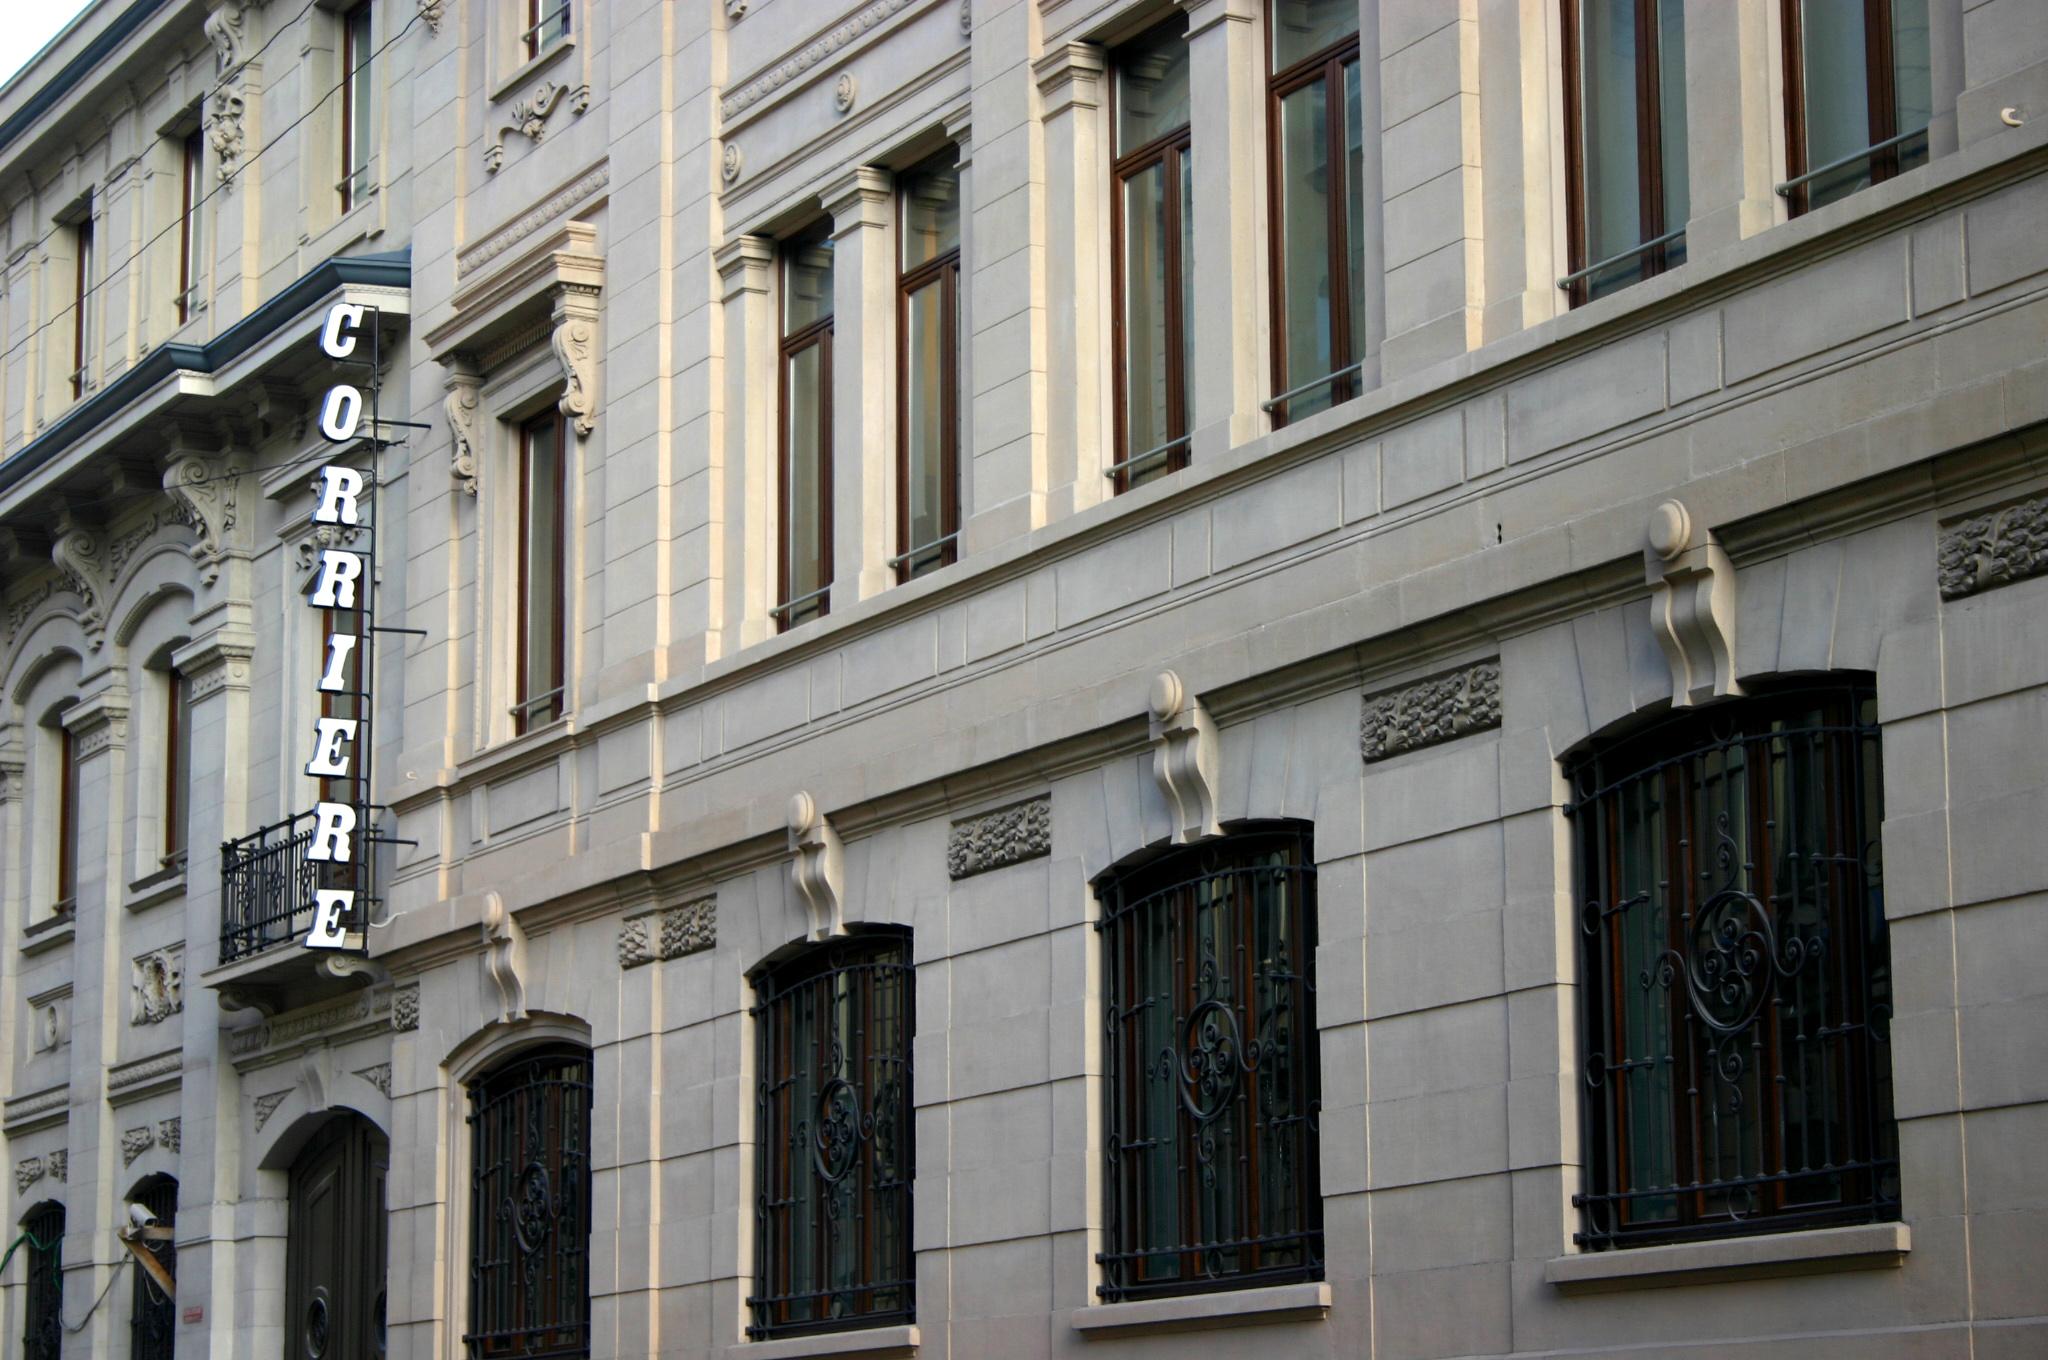 Mannaia Rcs: ottocento tagli e chiude Via Solferino